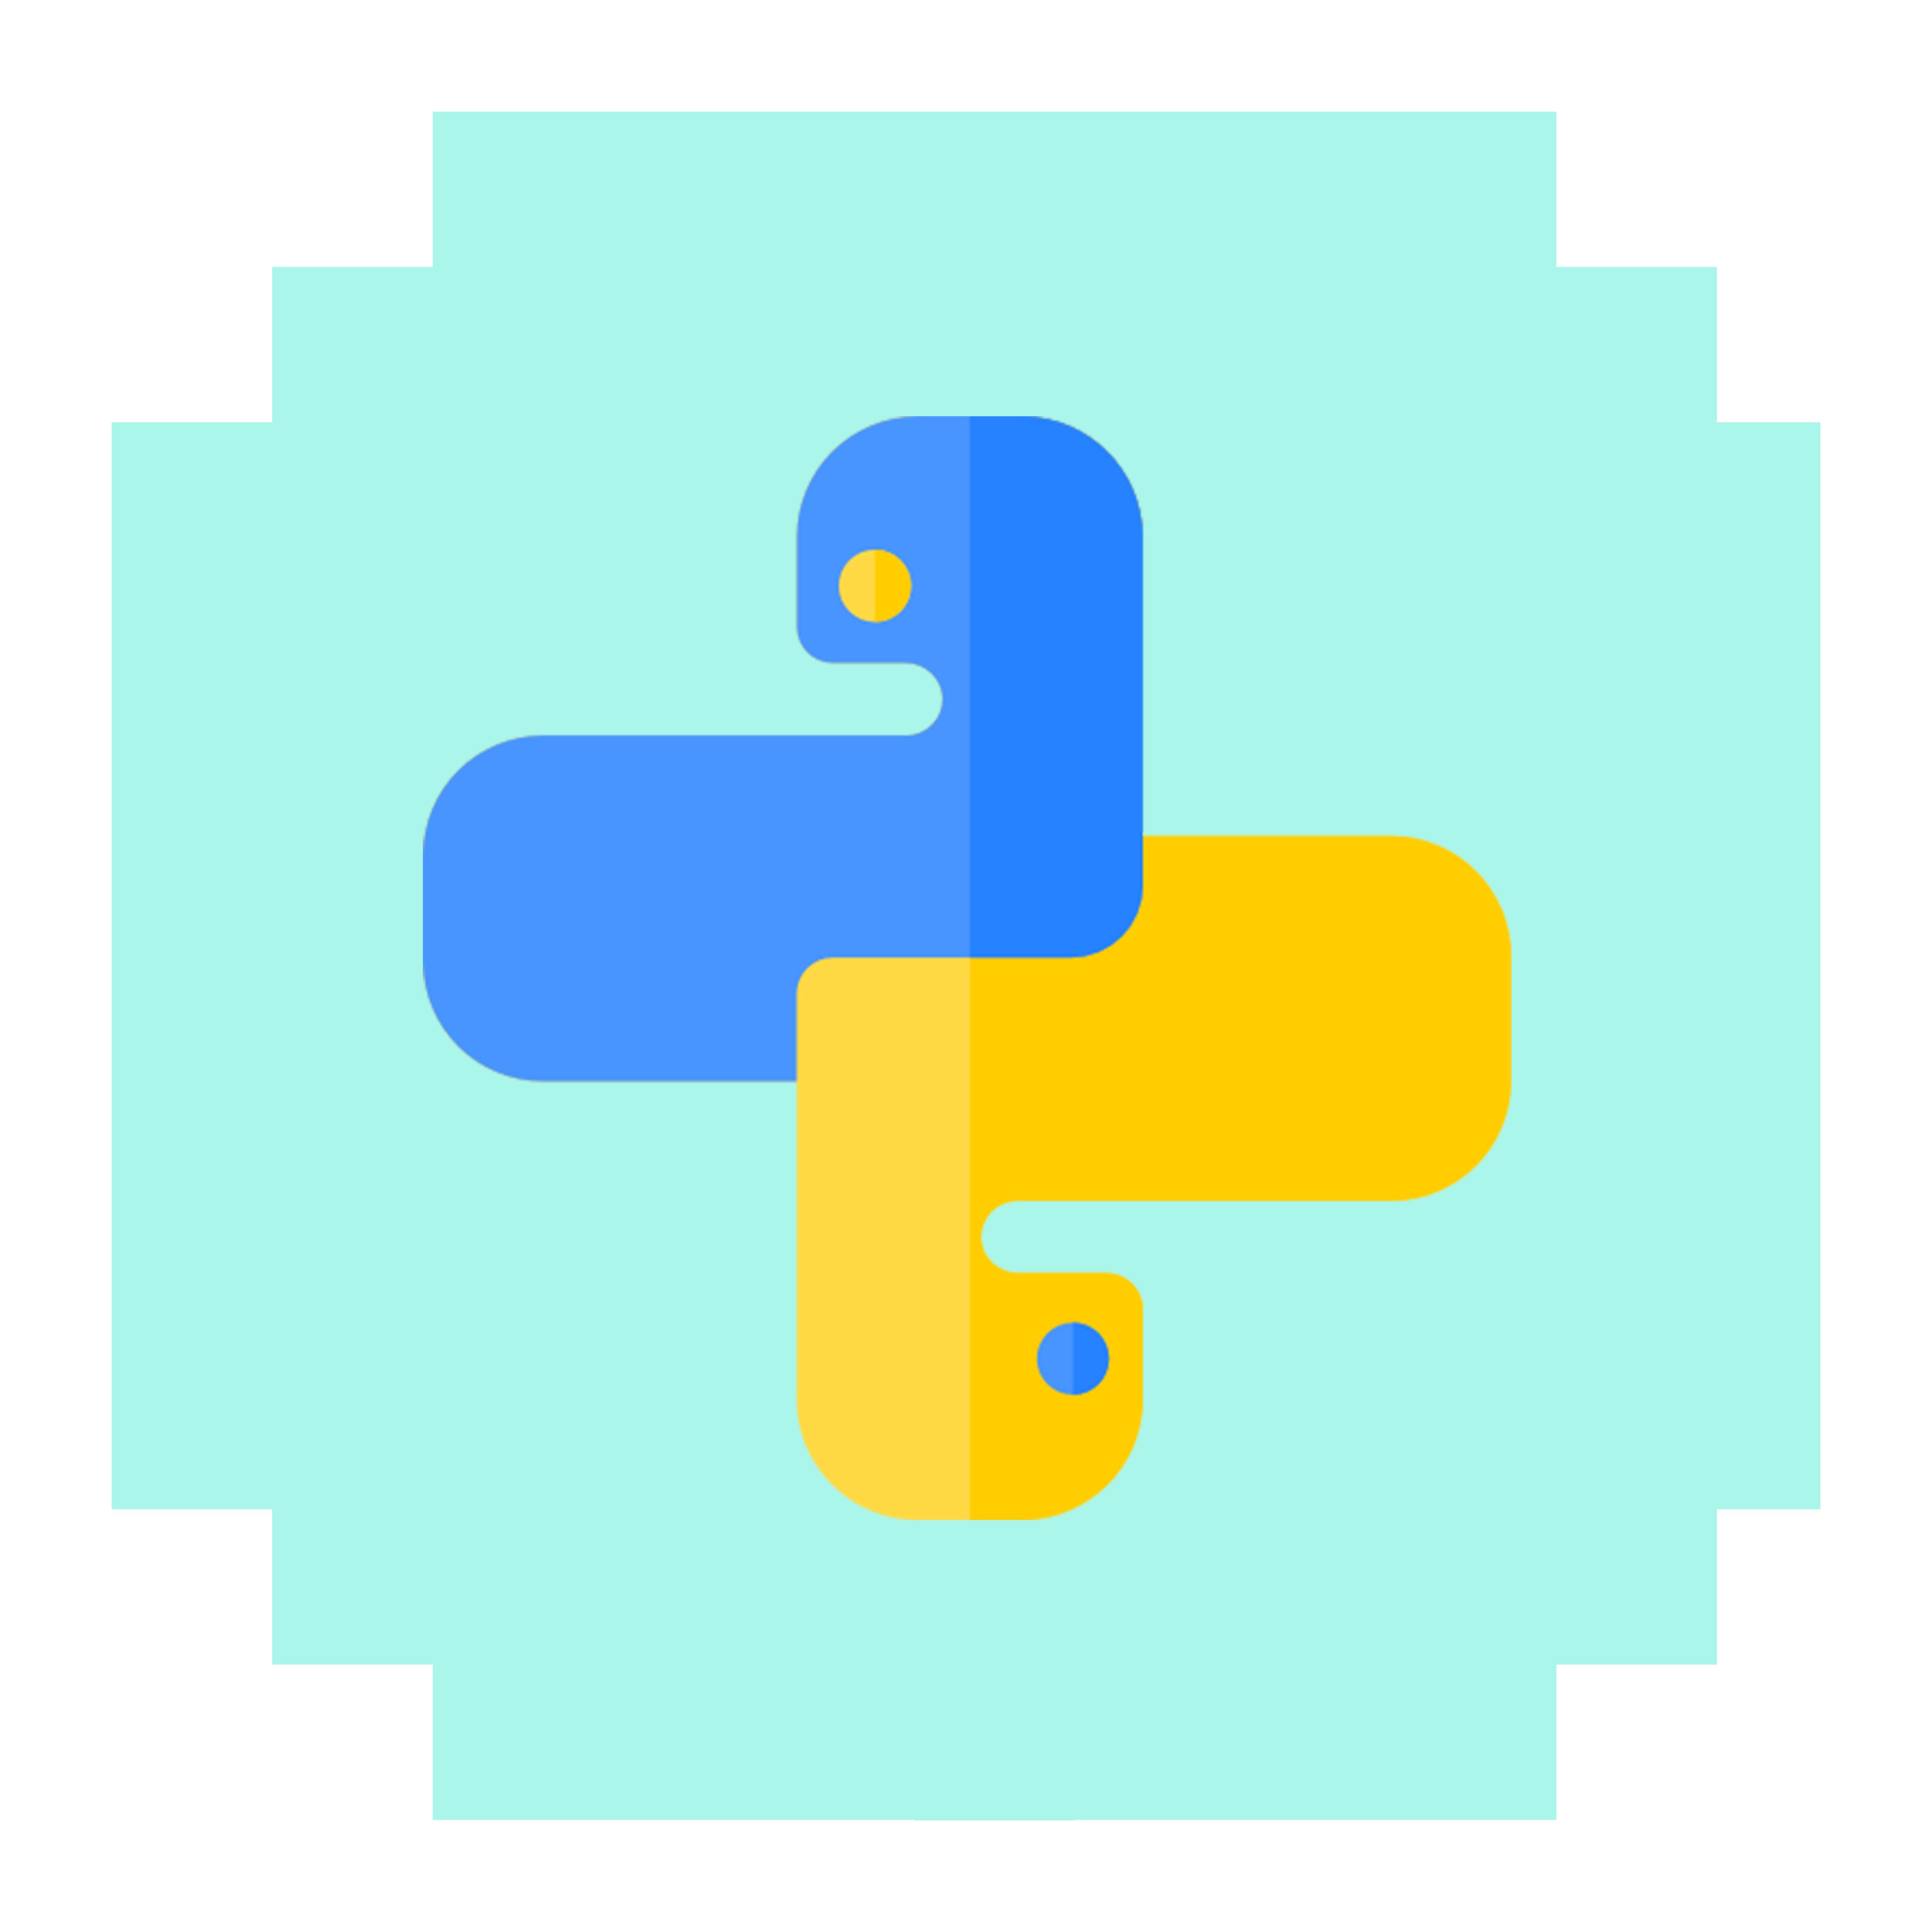 Python: First Steps